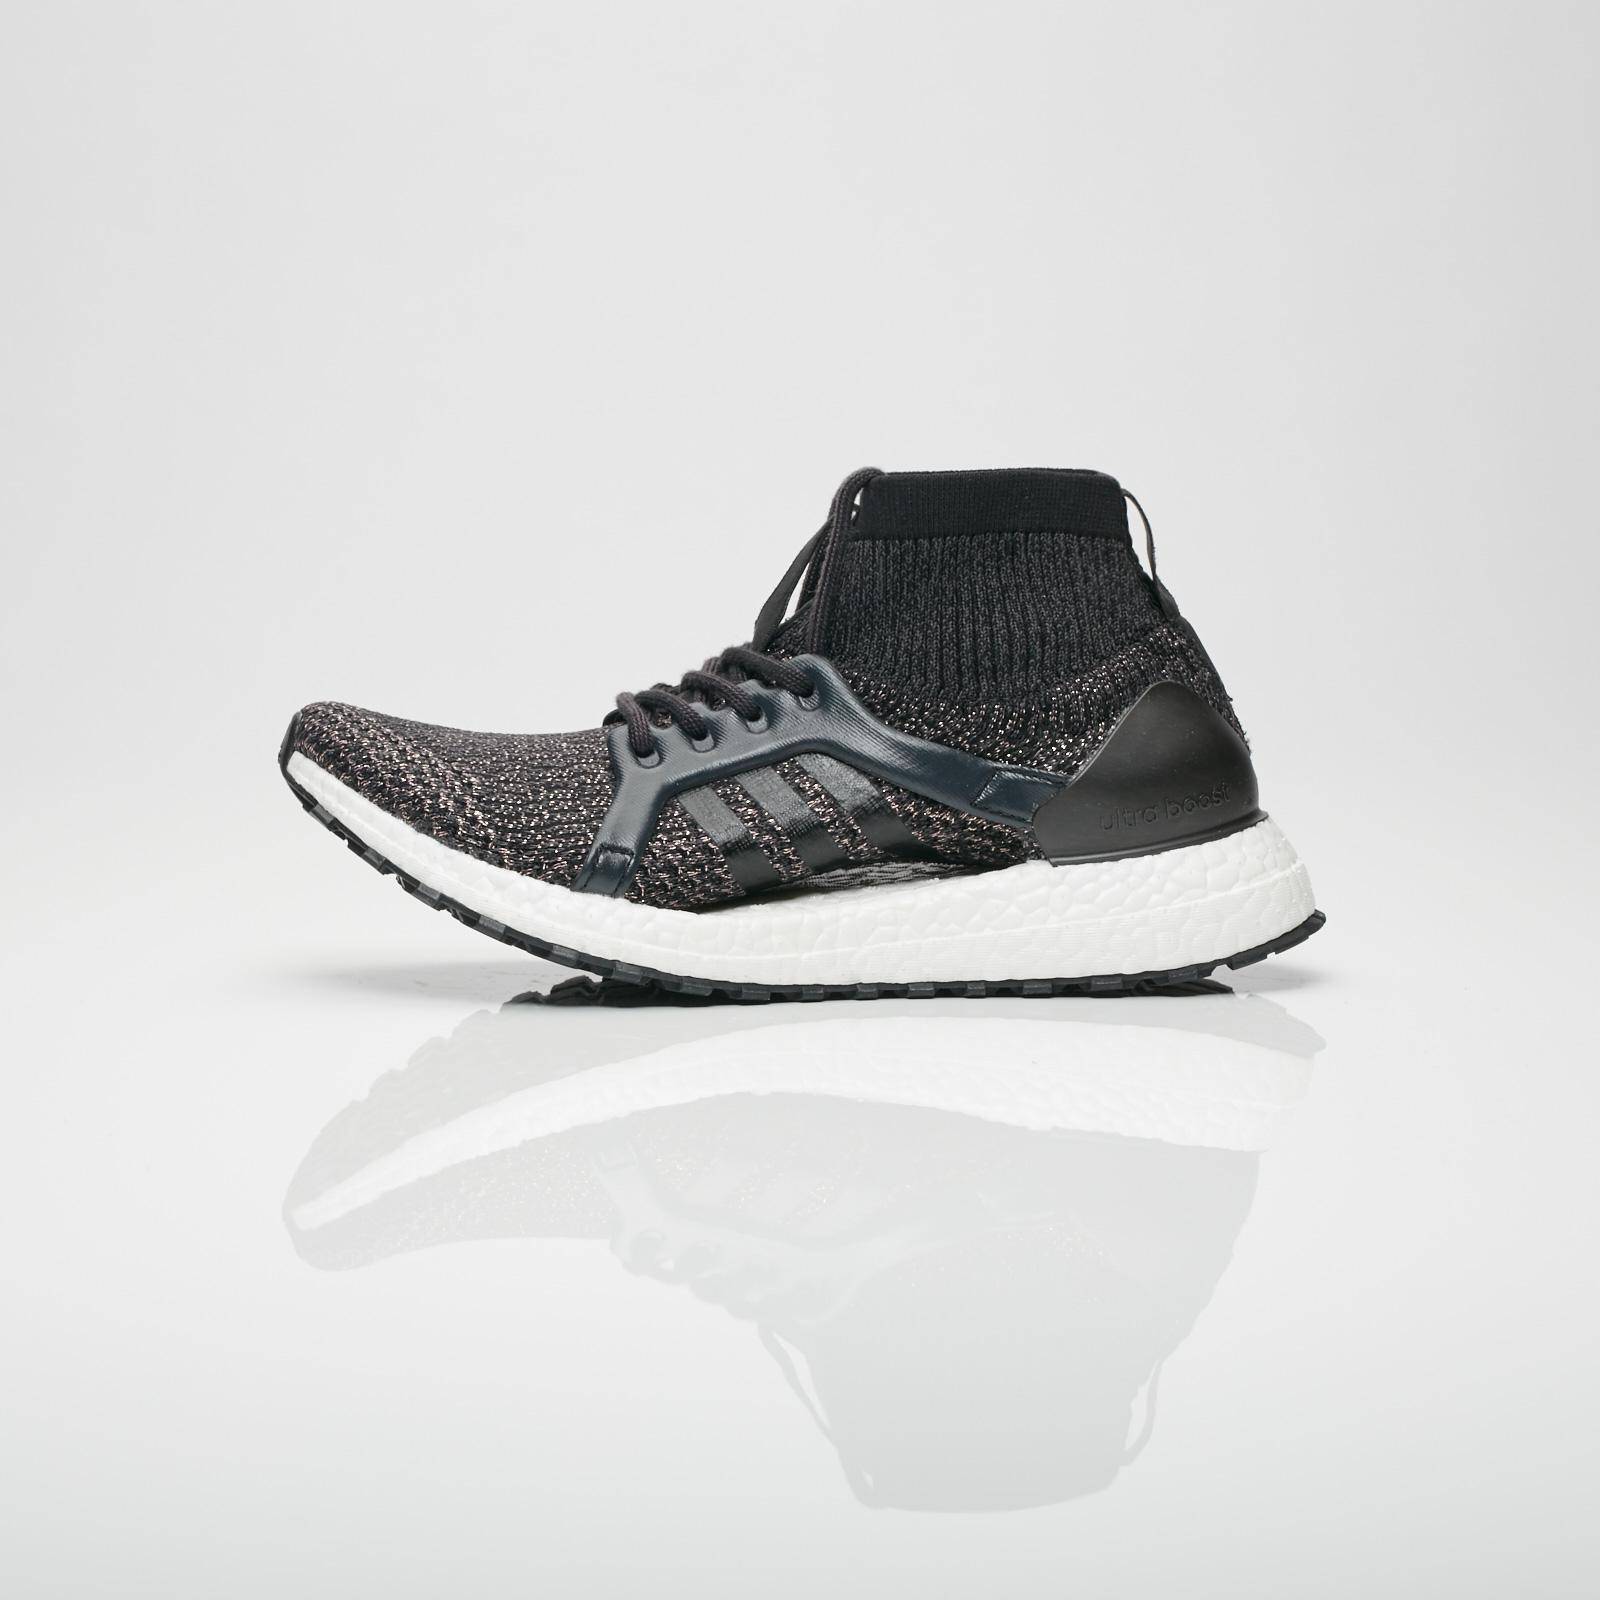 8a49147cc50 adidas UltraBOOST X ATR lt - Cg3009 - Sneakersnstuff